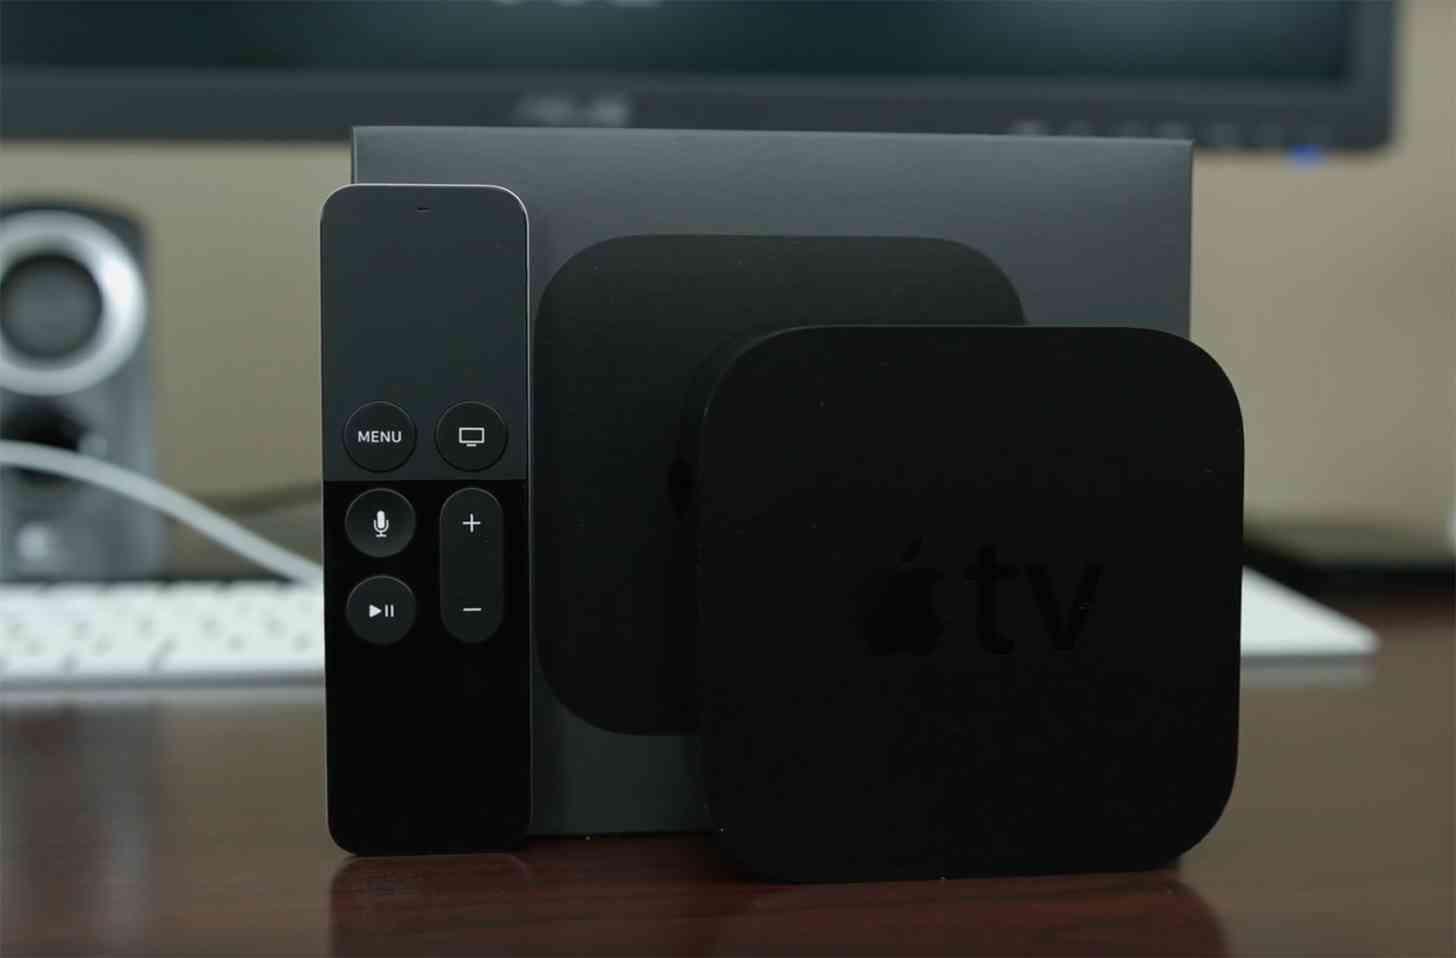 Apple TV hands-on video